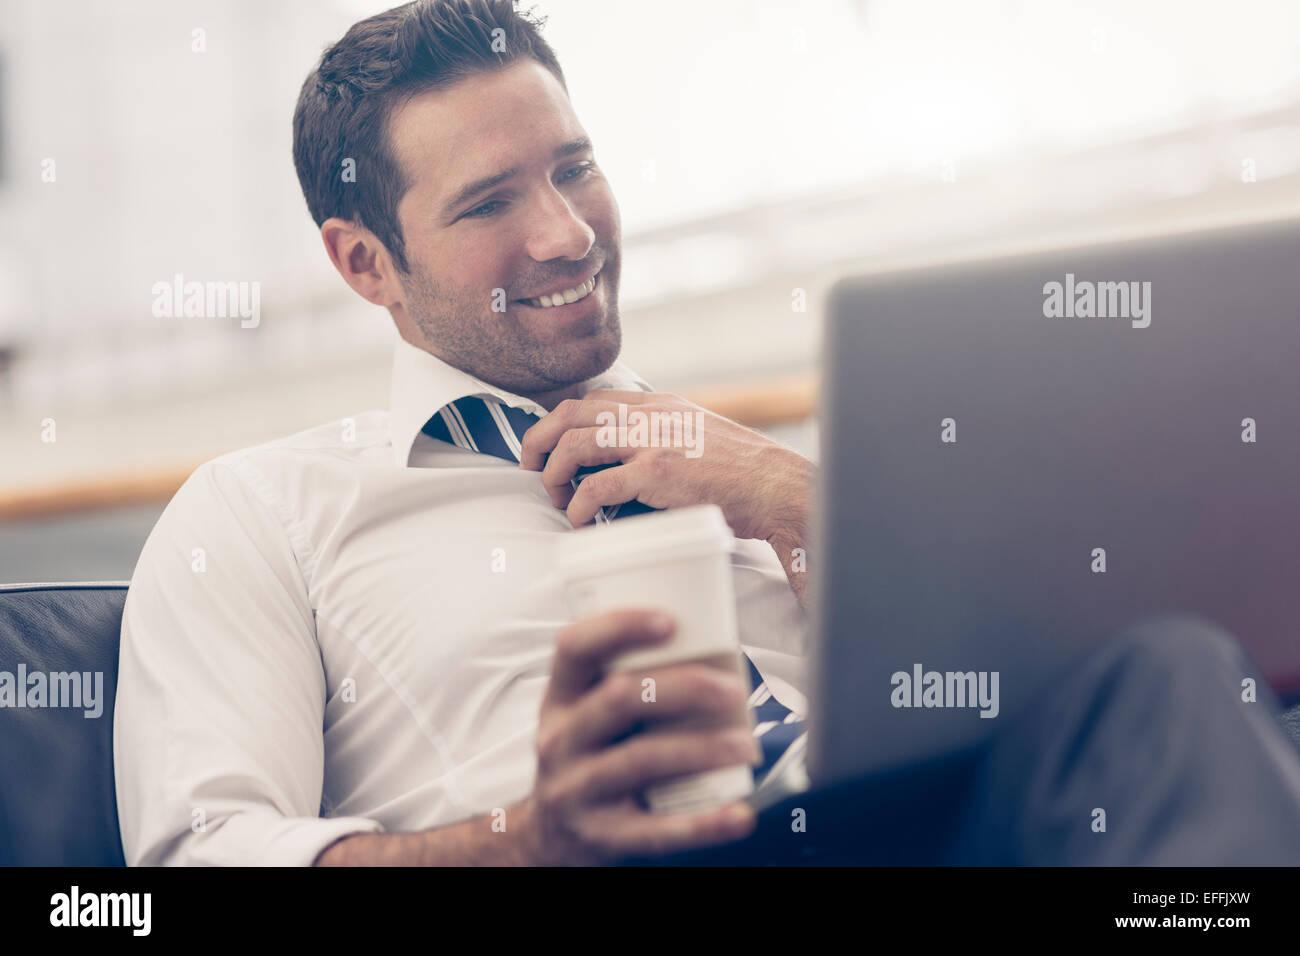 Retrato de un hombre de negocios relajante Imagen De Stock